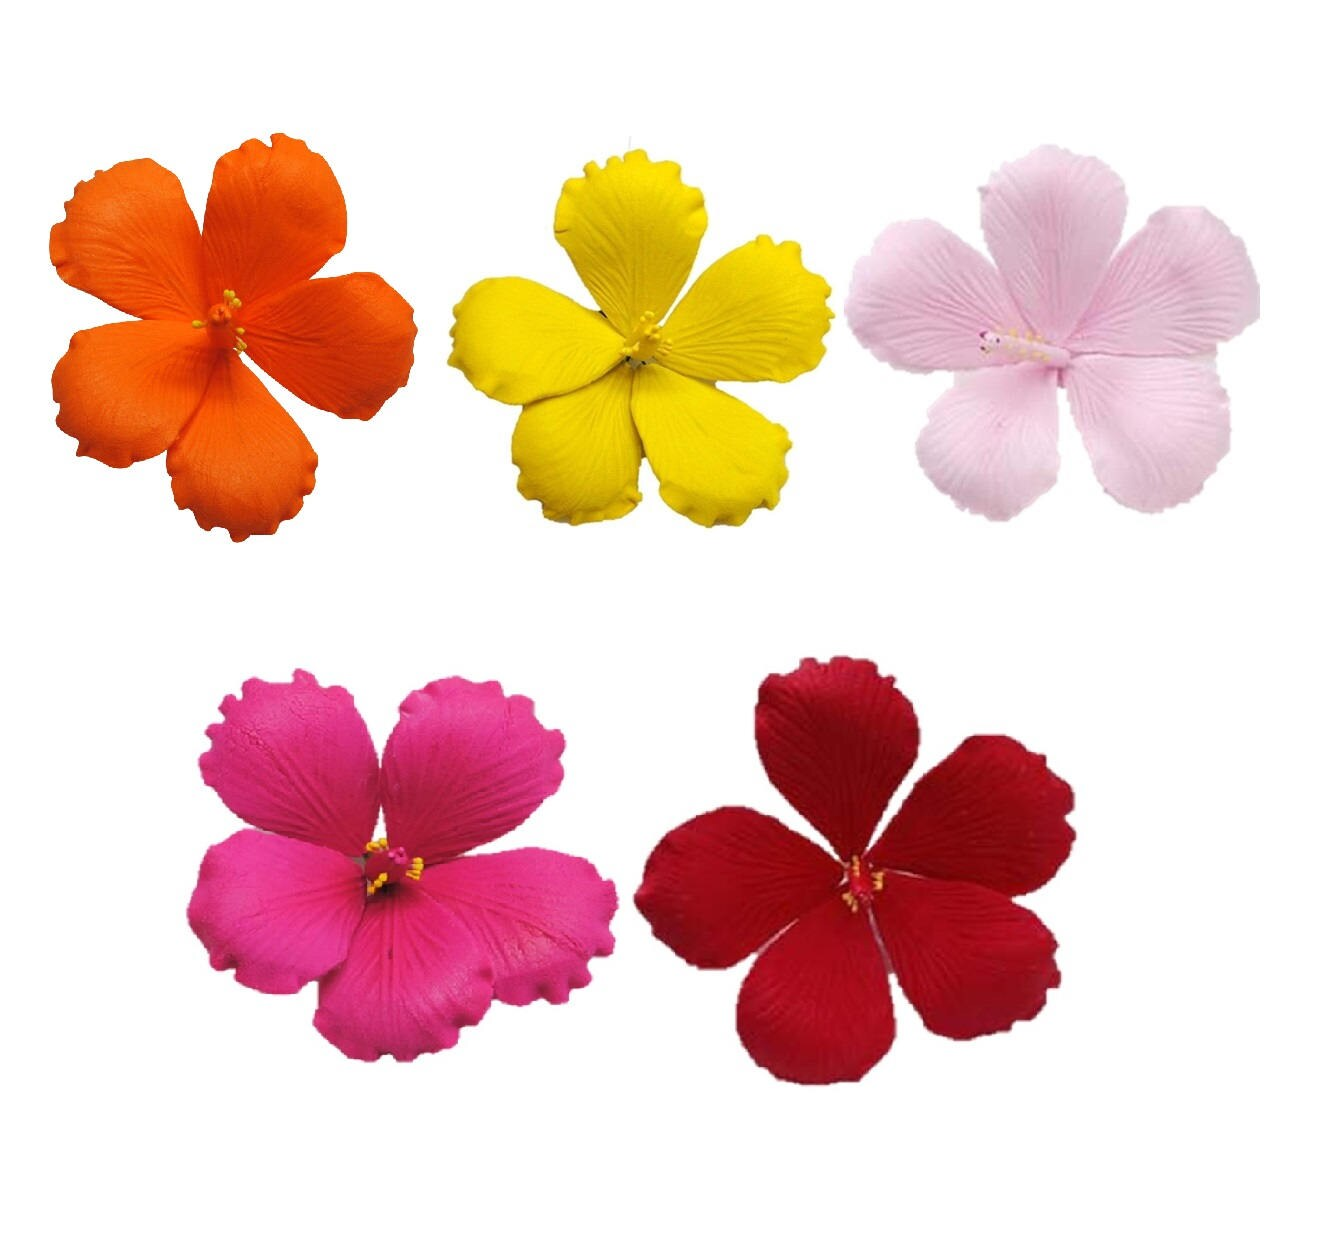 5 Flower Set 35 Gumpaste Hibiscus Orange Yellow Red Hot Etsy